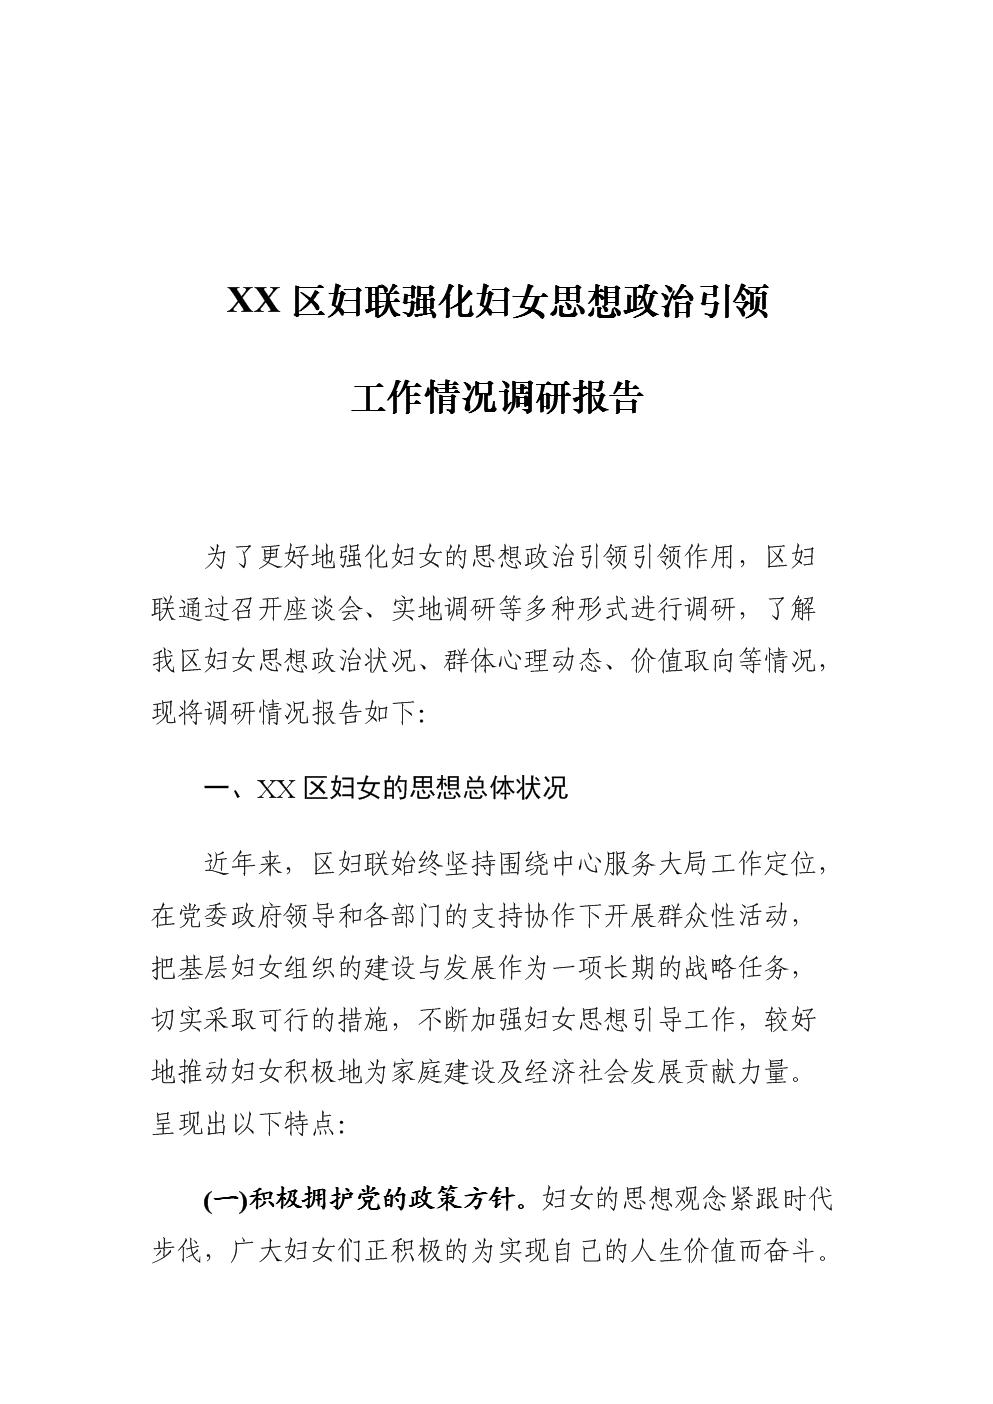 XX区妇联强化妇女思想政治引领工作情况调研报告.docx